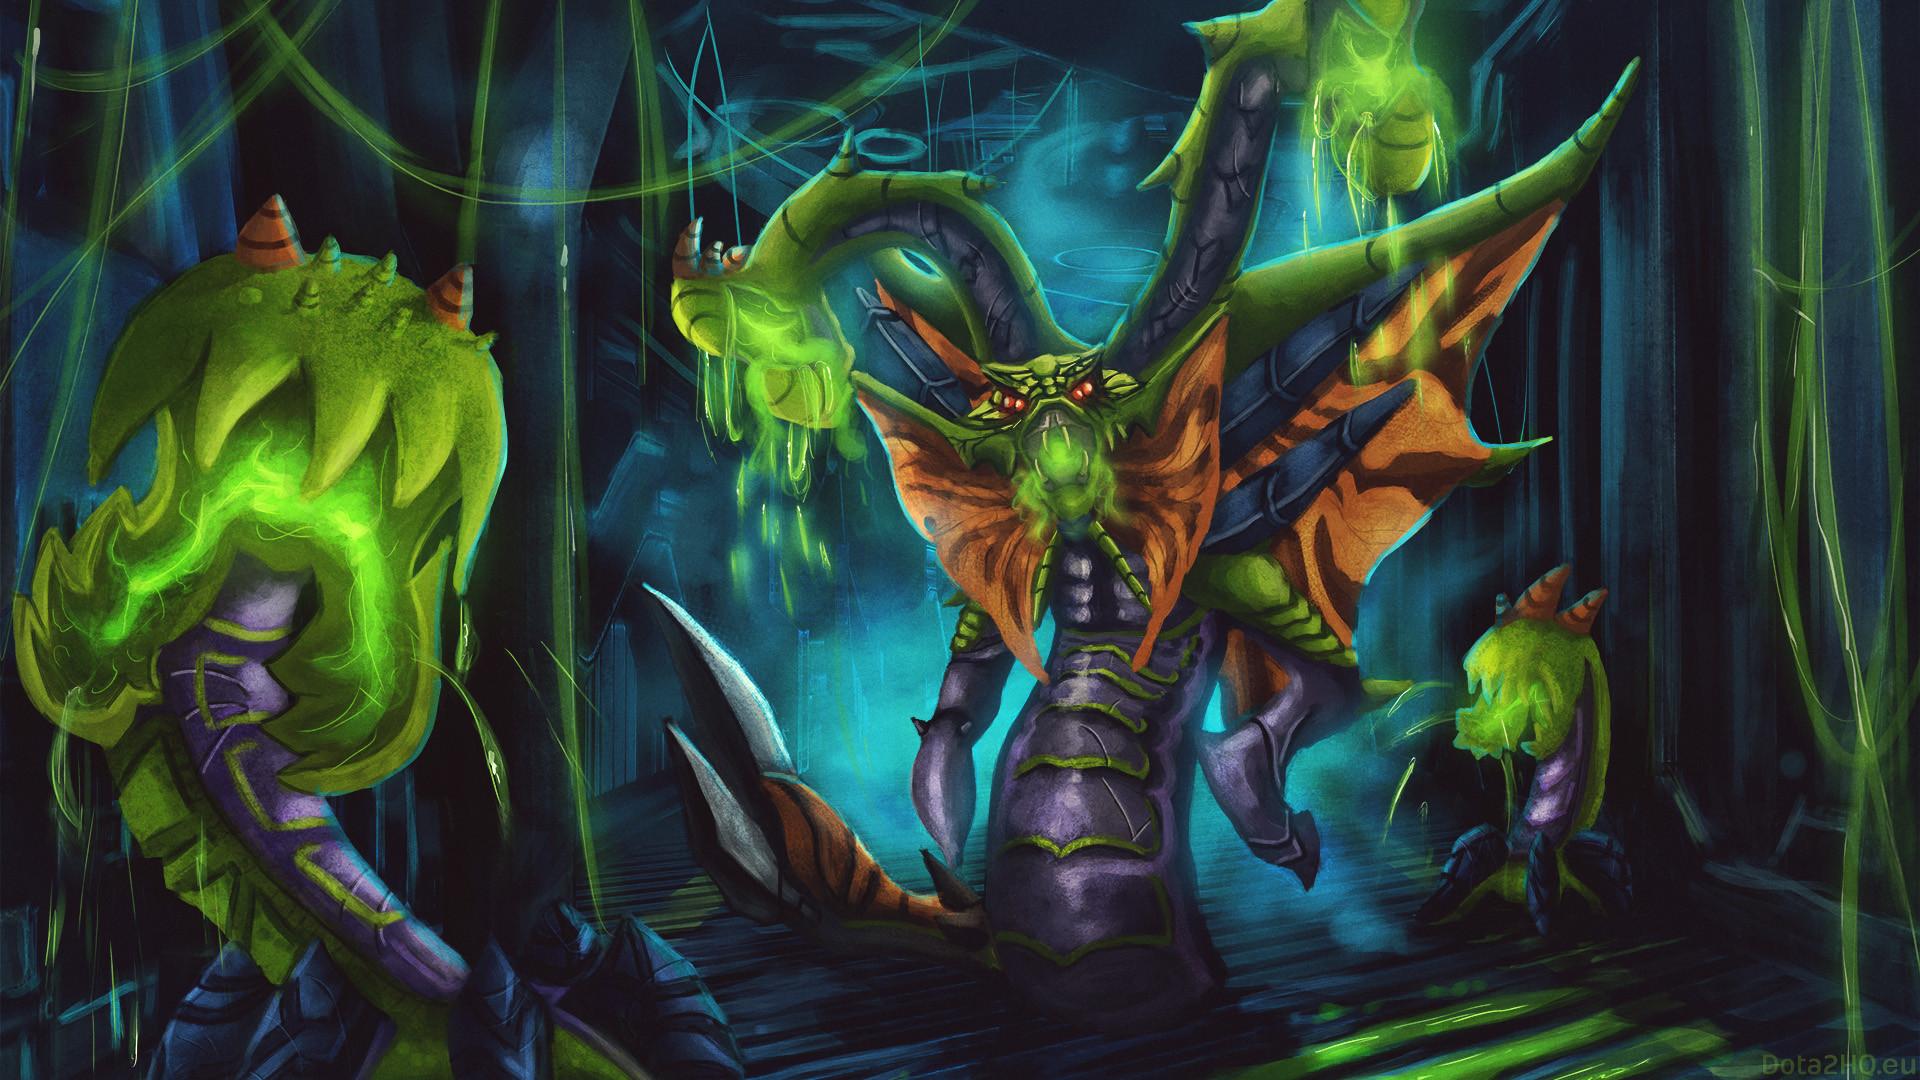 Venomancer Wallpaper [The Acid Hydra]